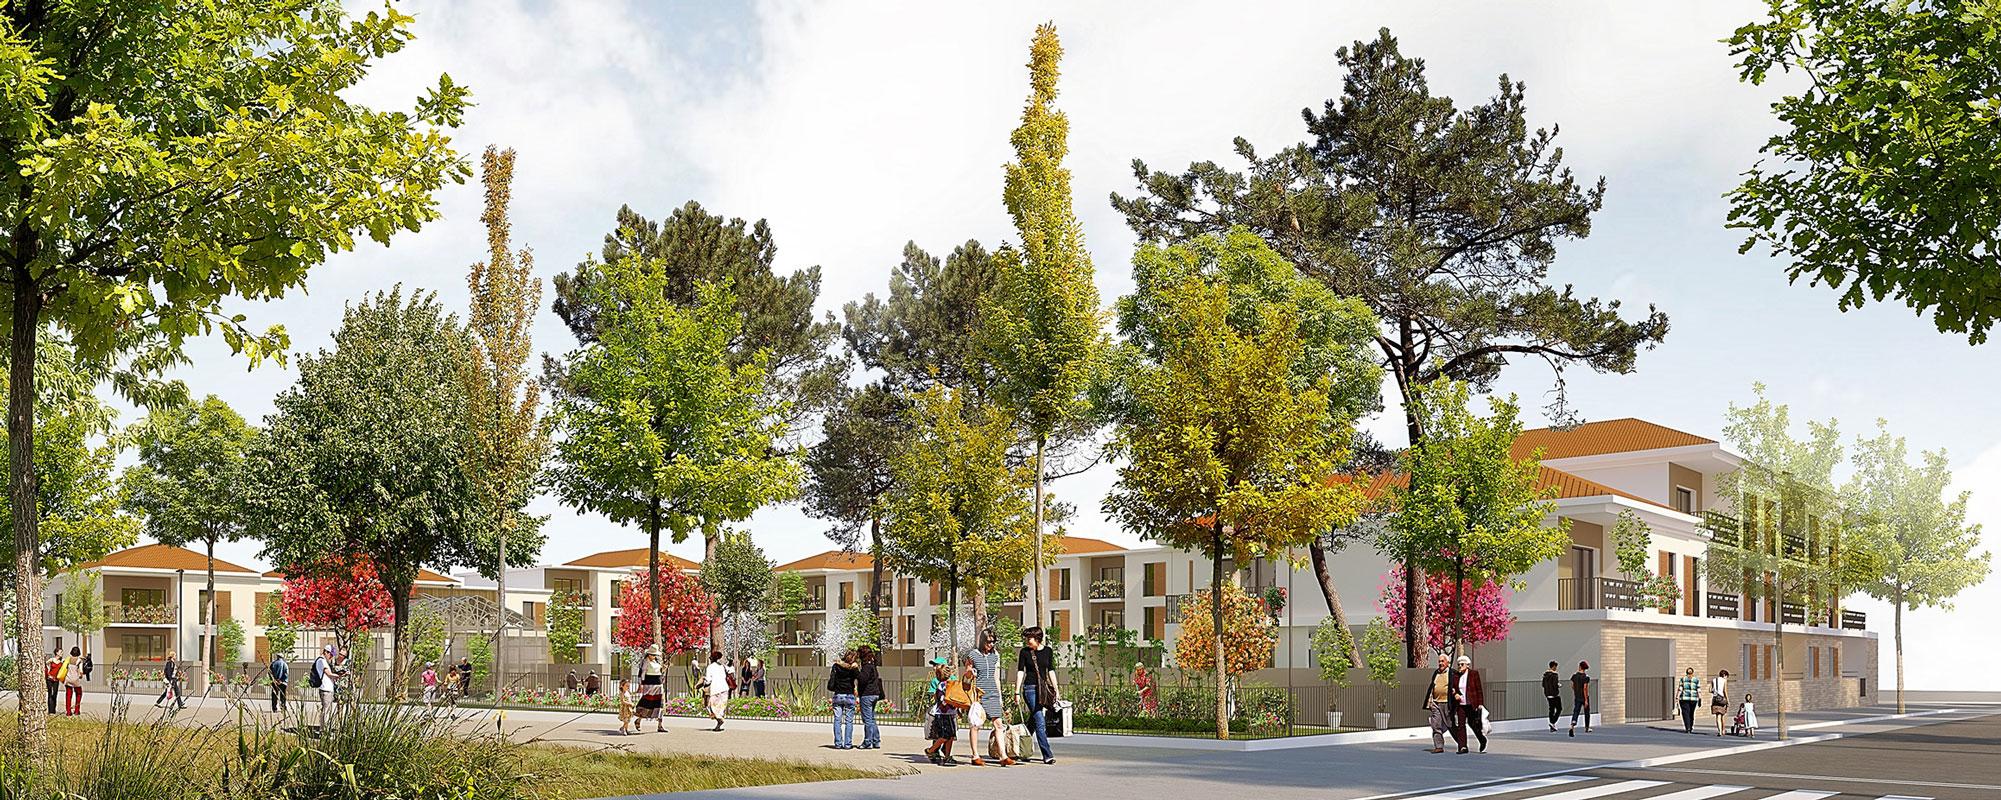 RESIDENCE SENI'OR II - 102 logements